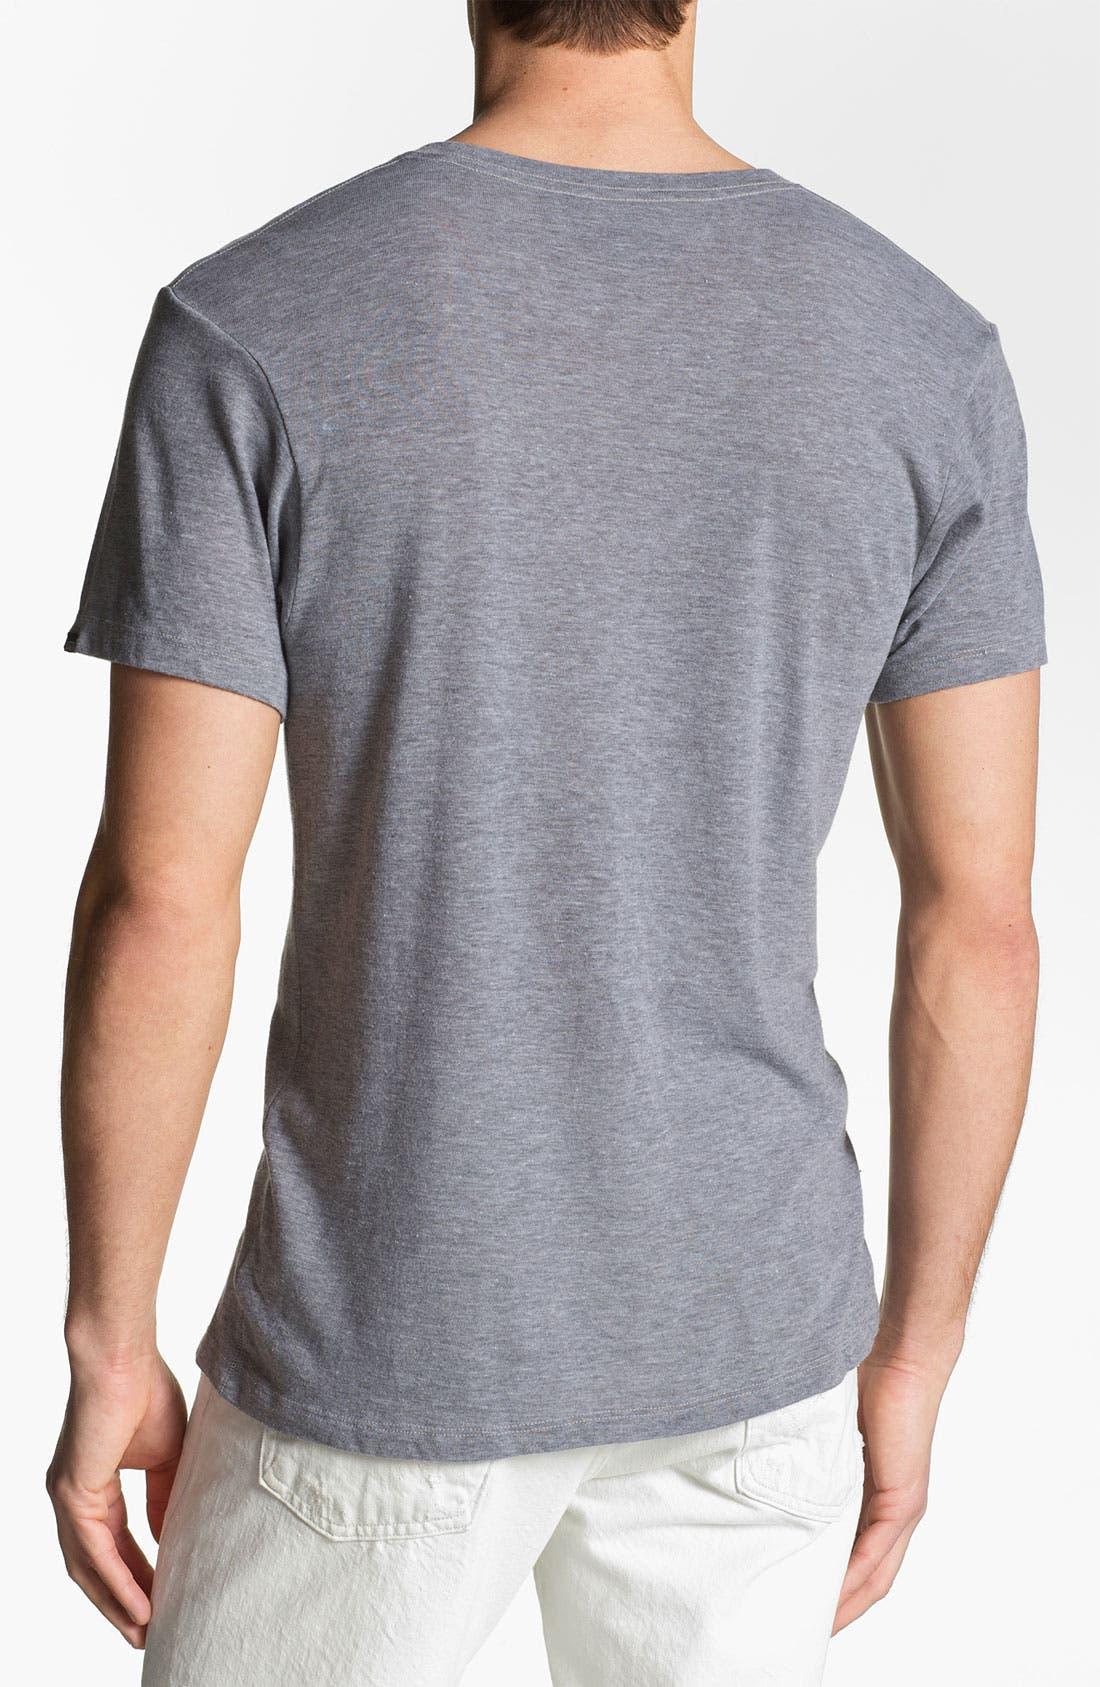 Alternate Image 2  - Vans 'Pista' T-Shirt